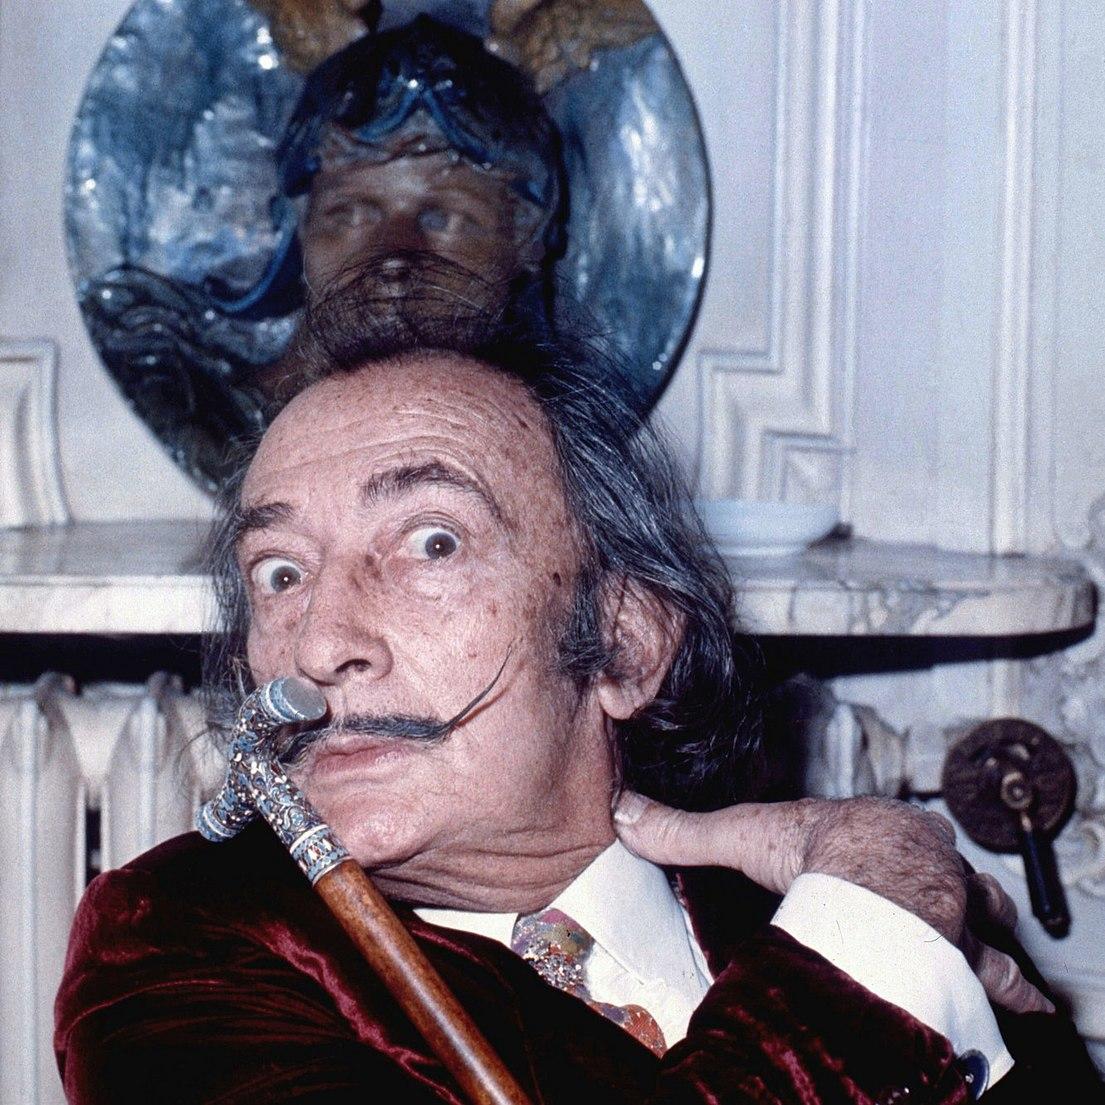 Salvador Dalí and Dance